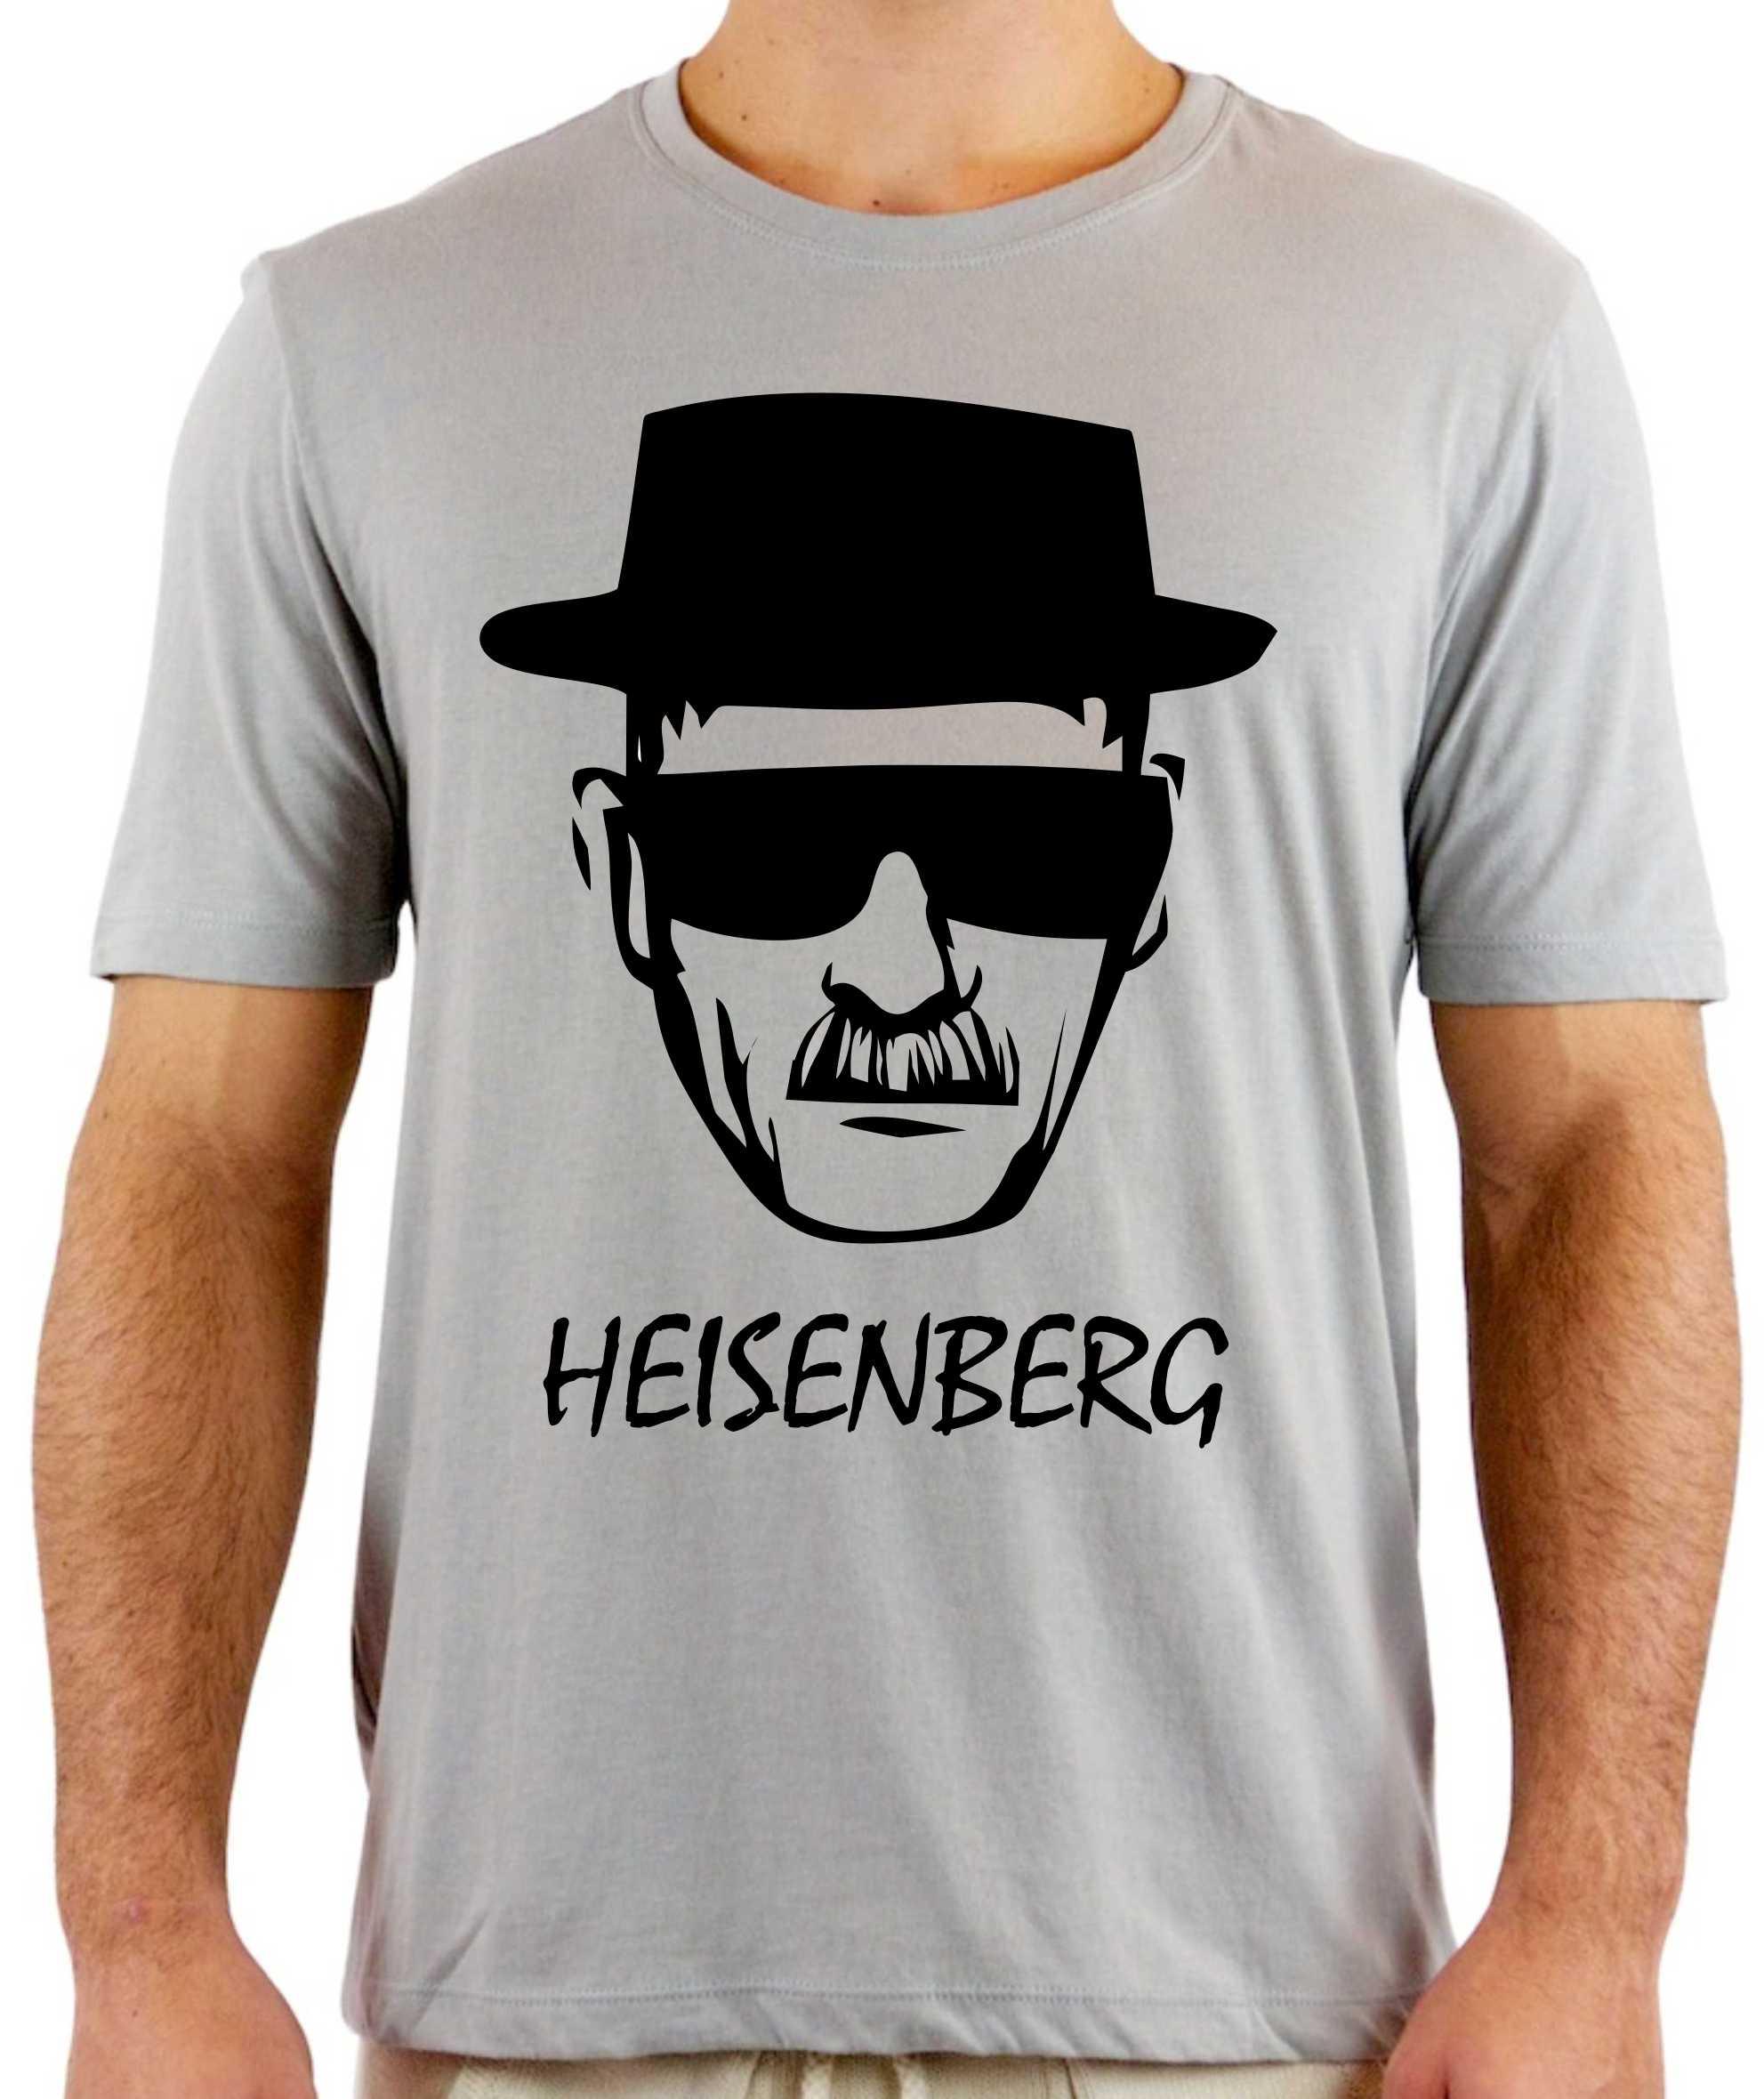 ea1a942eb Camiseta Breaking Bad Heisenberg no Elo7